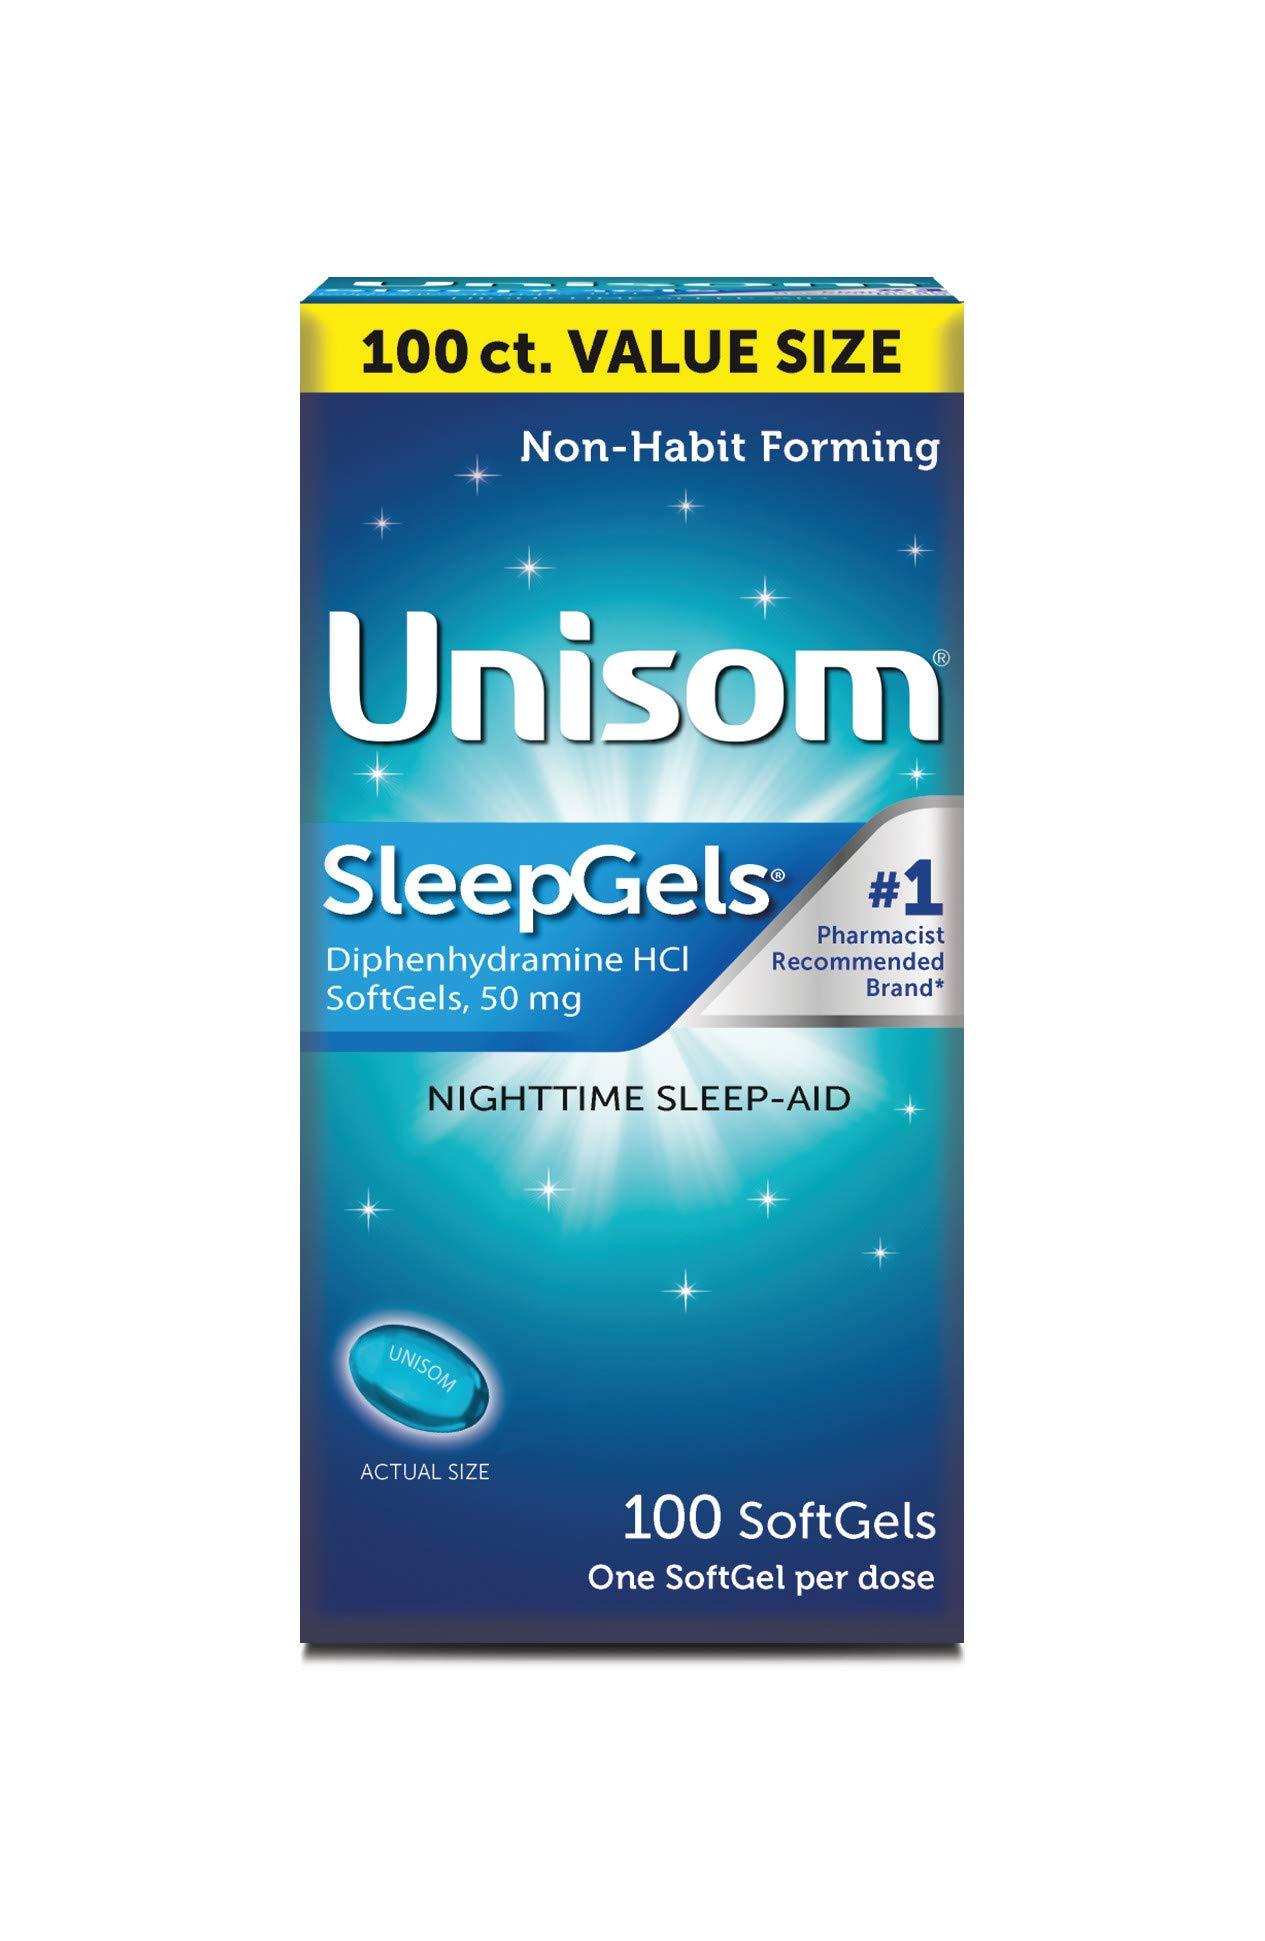 Unisom SleepGels, Nighttime Sleep-Aid, 50 mg Diphenhydramine HCl, 100 Soft Gel Capsules by Unisom